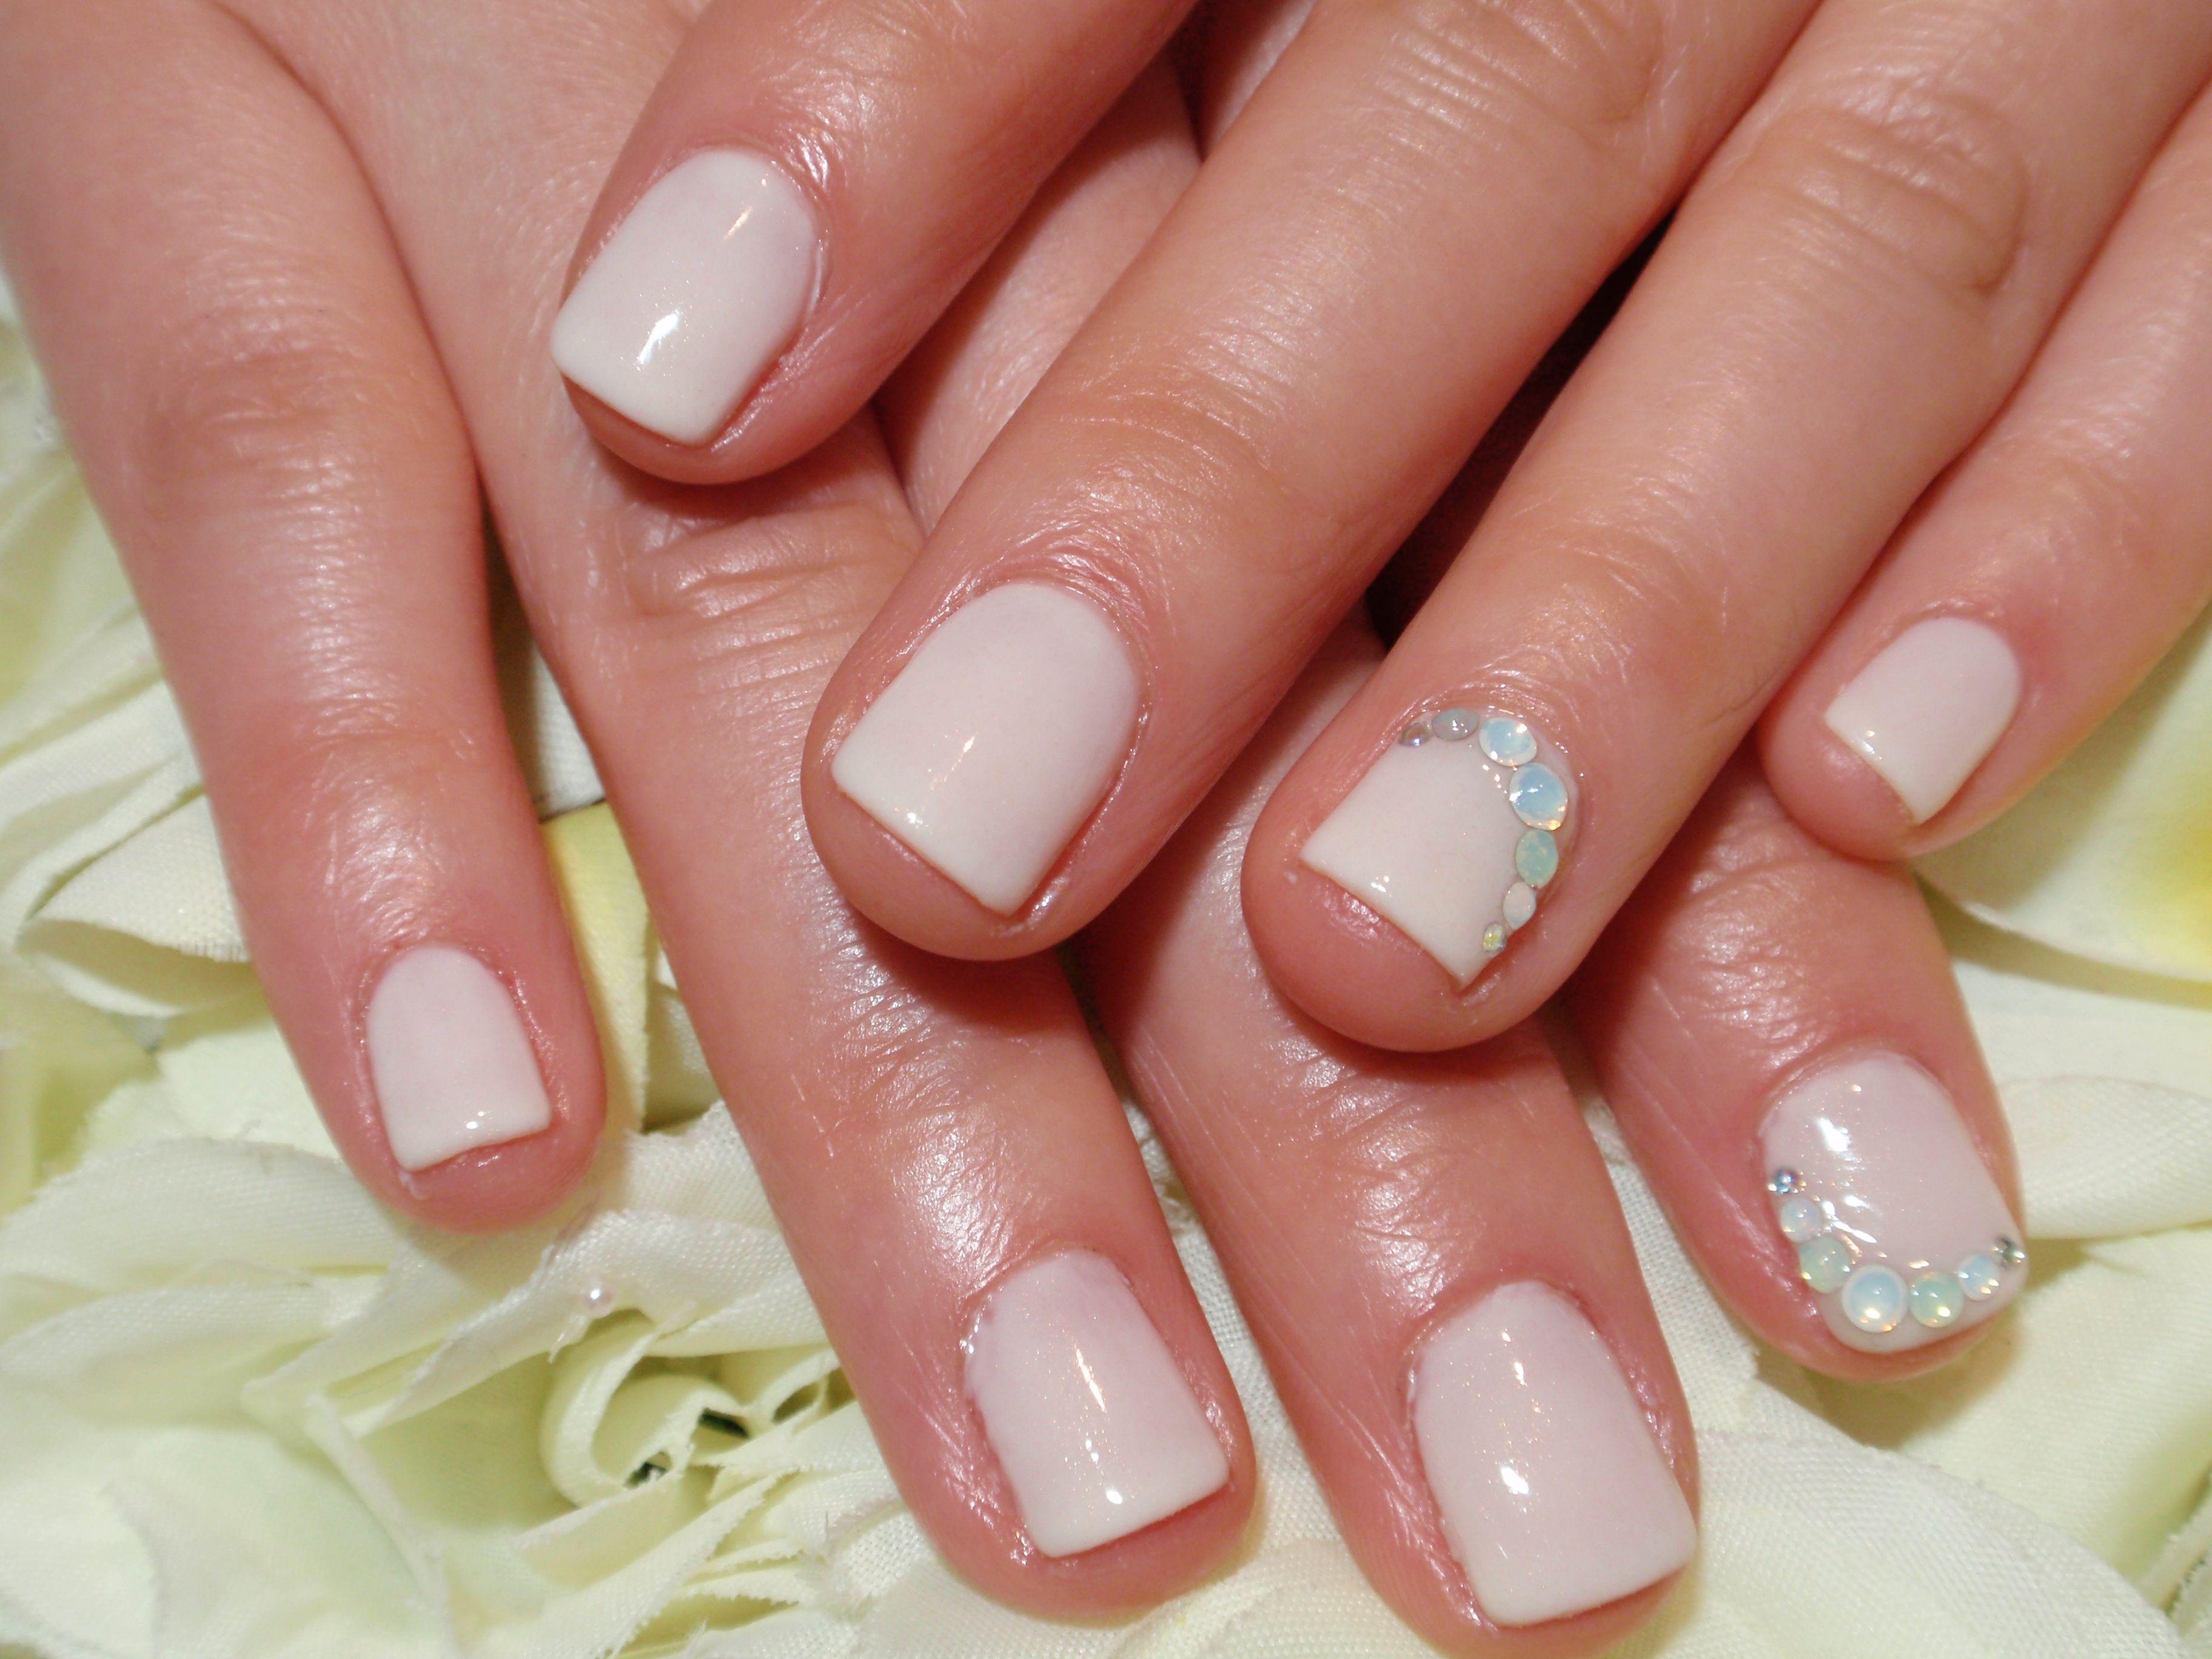 Simply wedding ivory nails | nail love | Pinterest | Flor de loto y Flor